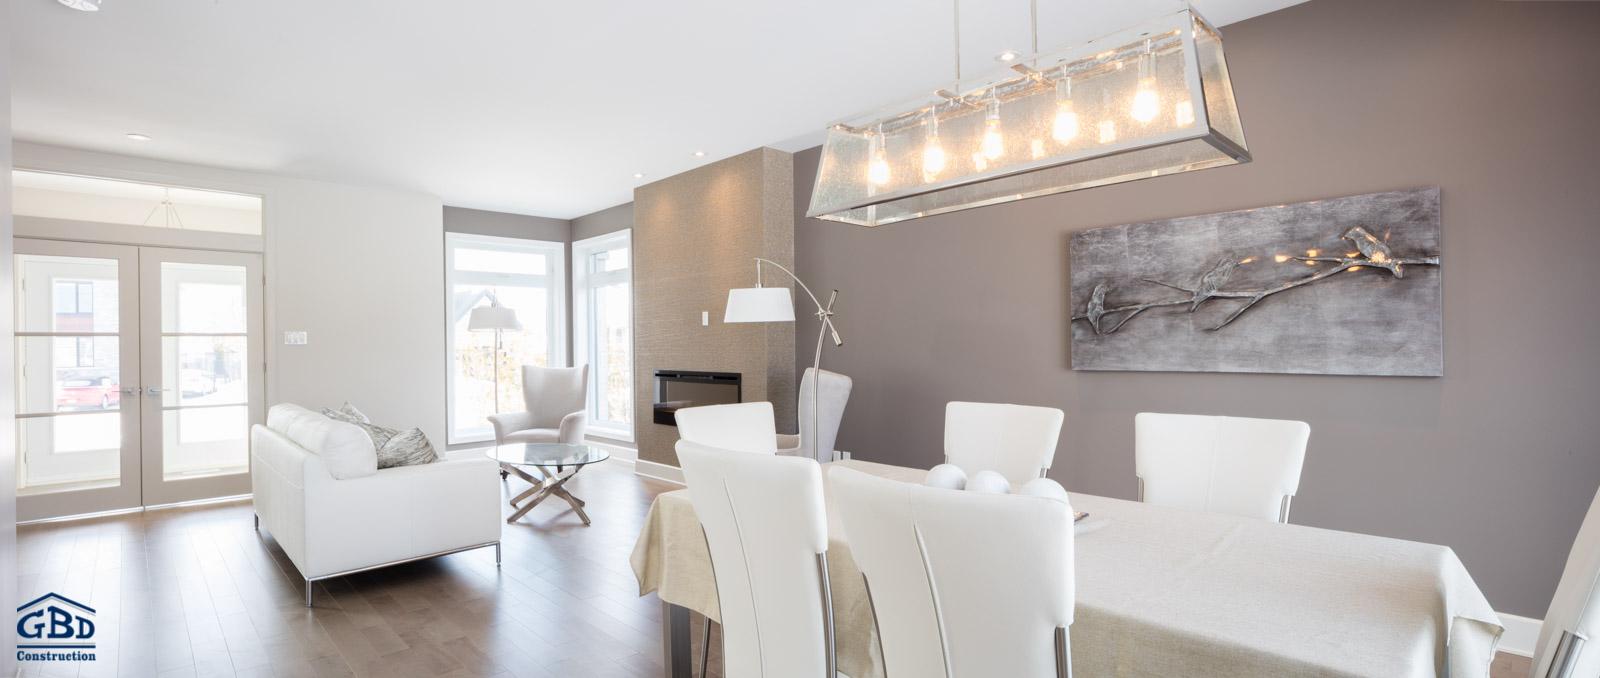 Maison neuve design design et maison neuve home design for Salle a manger karma